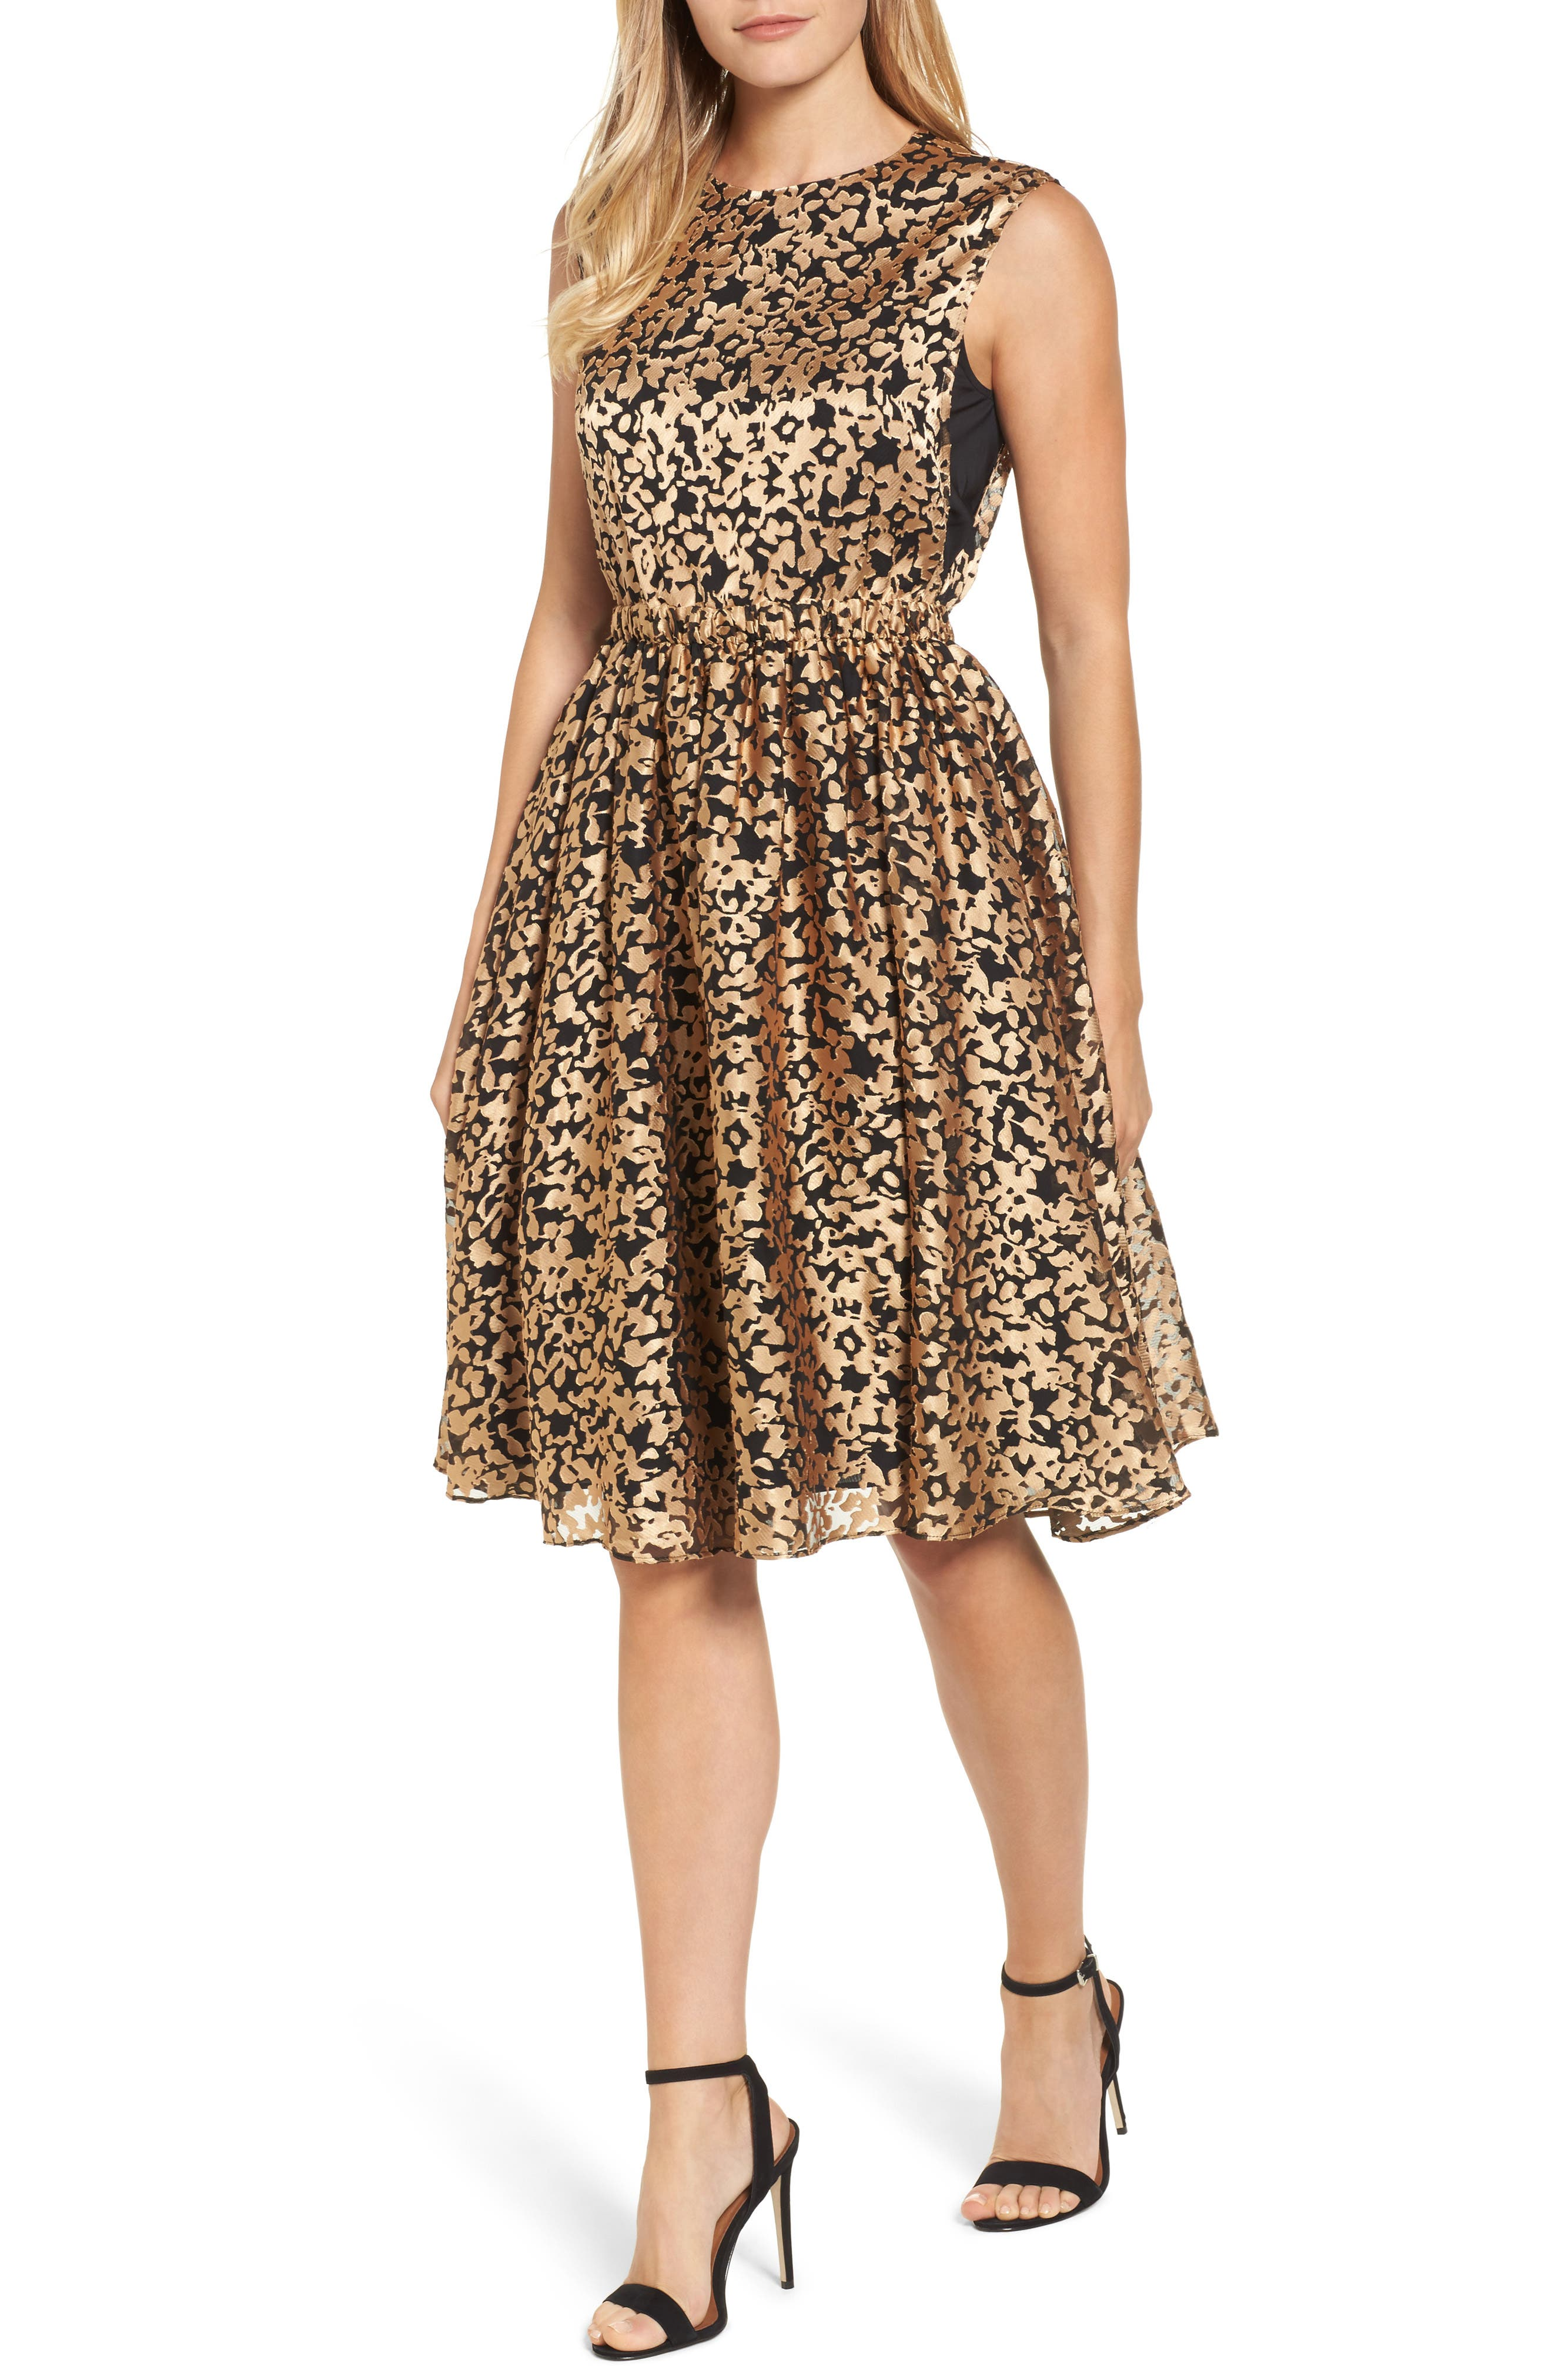 Kells Metallic Fit & Flare Dress,                         Main,                         color, Gold/ Black